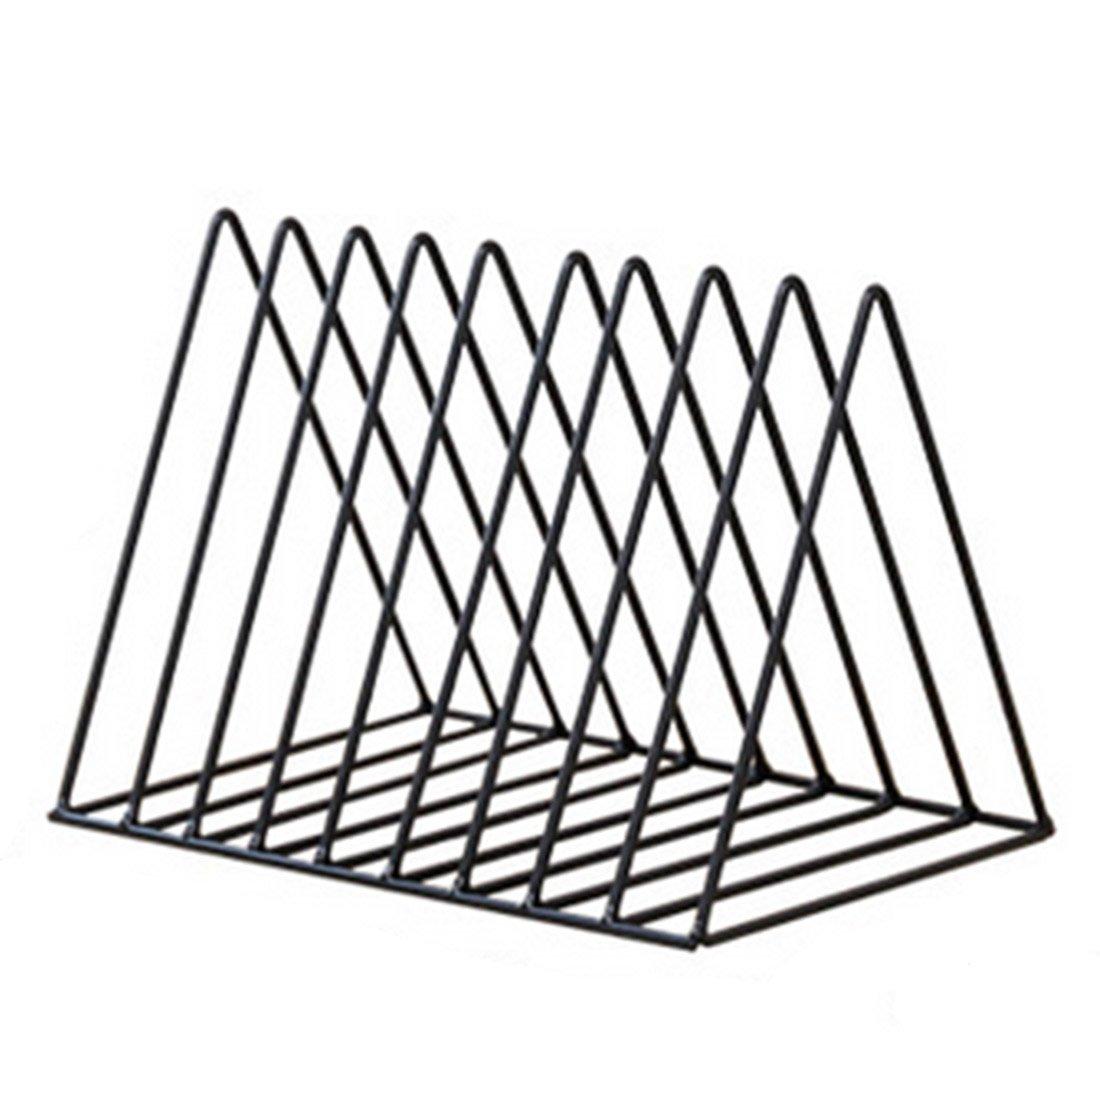 XSHION Bookshelf Triangle Simple Iron Art Desktop Storage Rack Magazine Organizer Book Holder (Black)